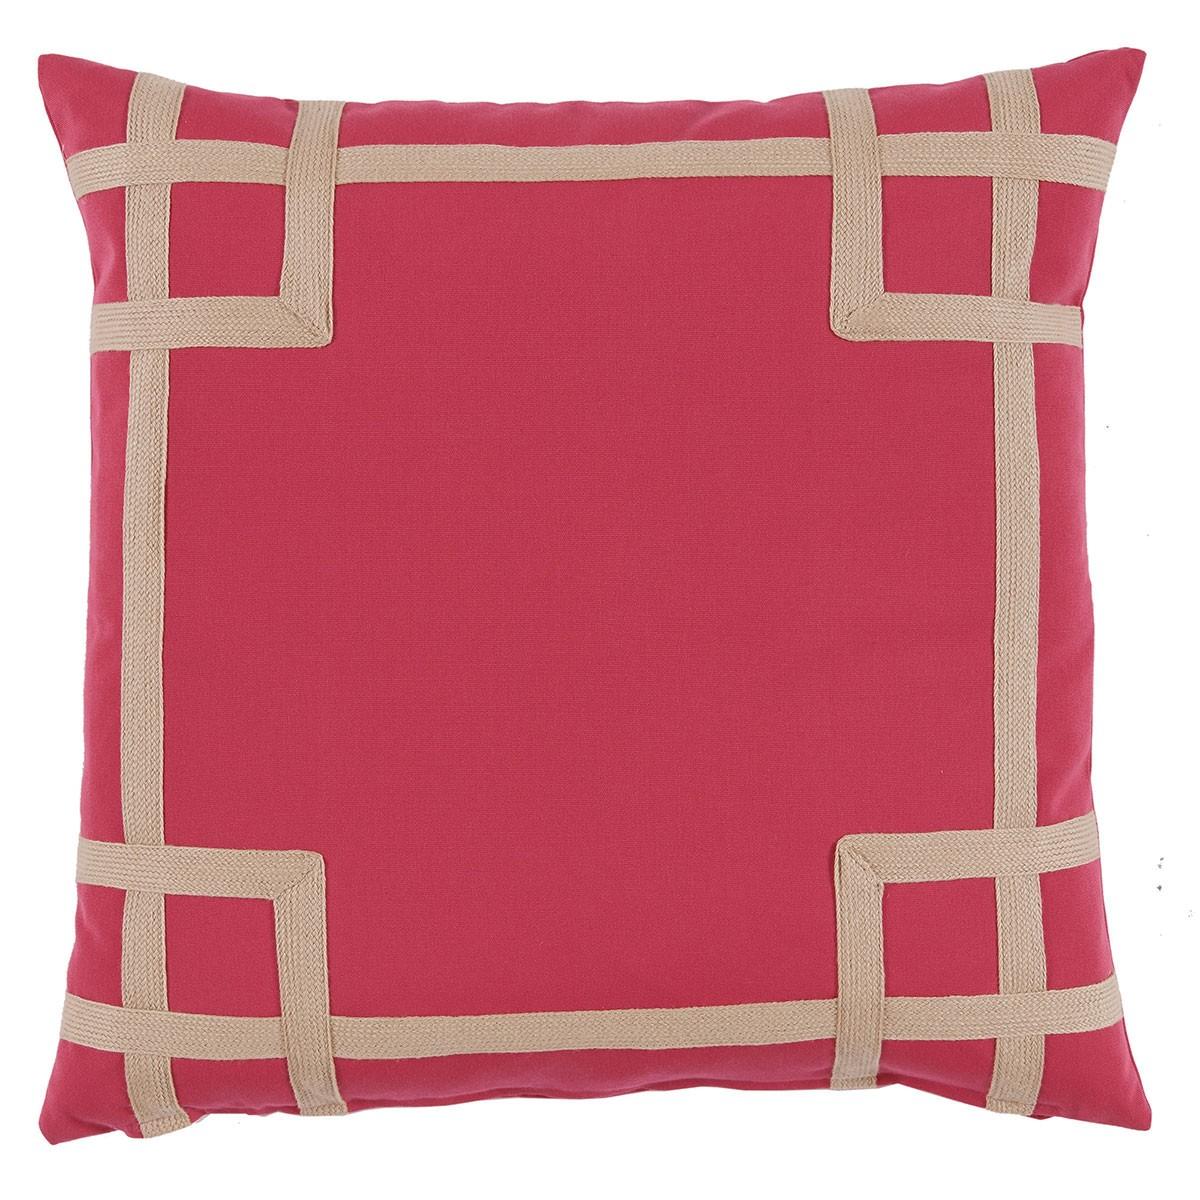 Pink Outdoor Pillows: Design Selections   HomesFeed